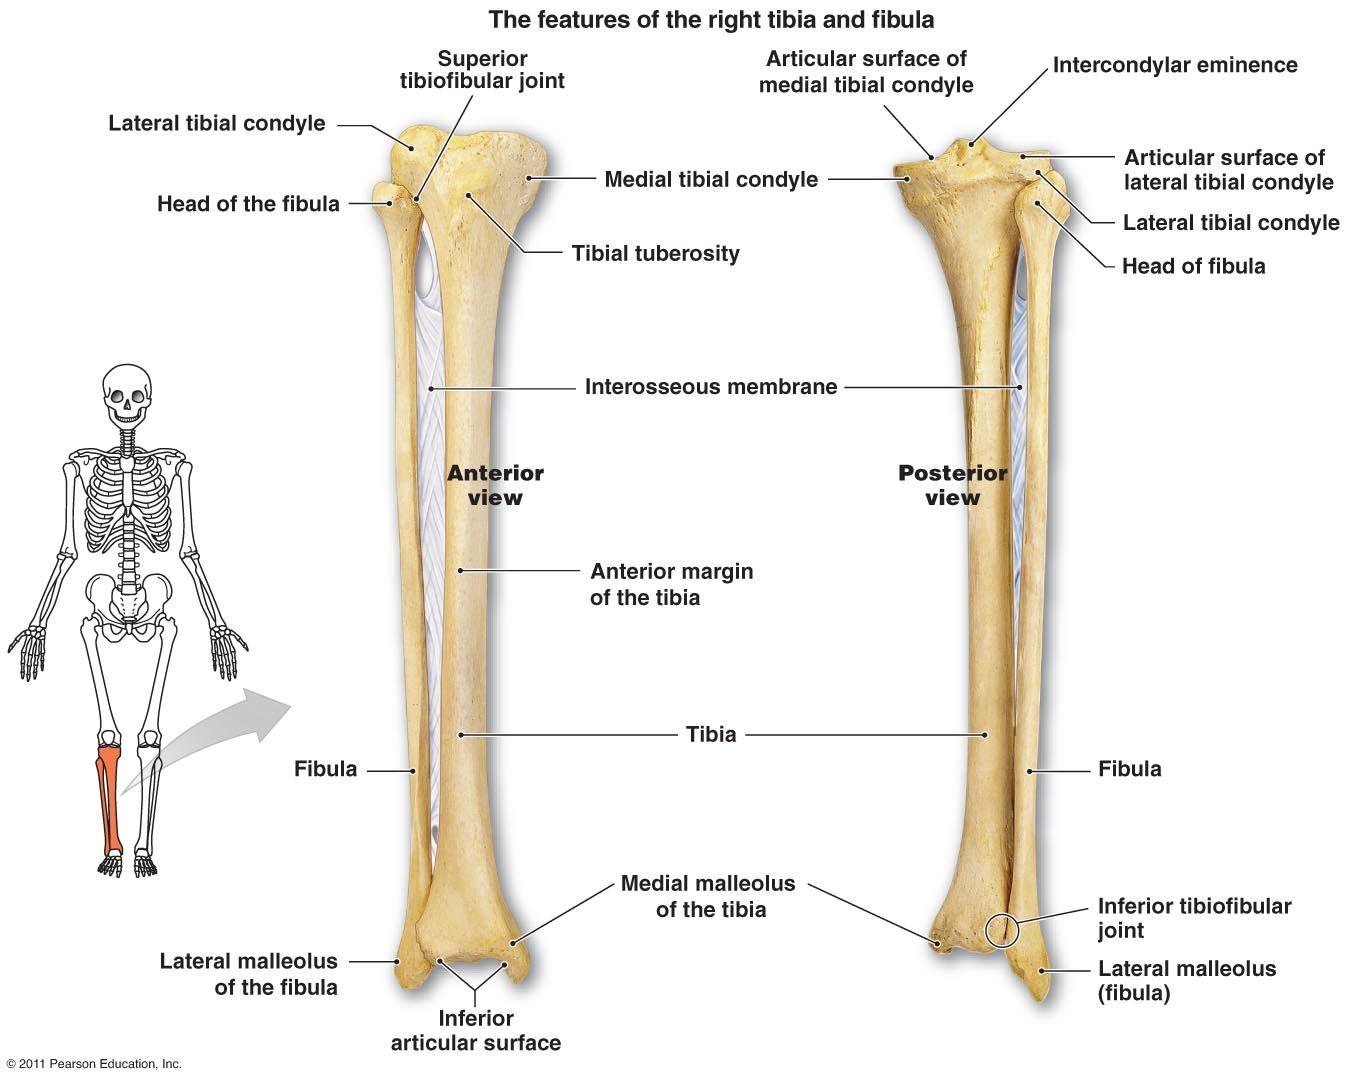 tibia and fibula diagram - Google Search | Radiography!! | Pinterest ...